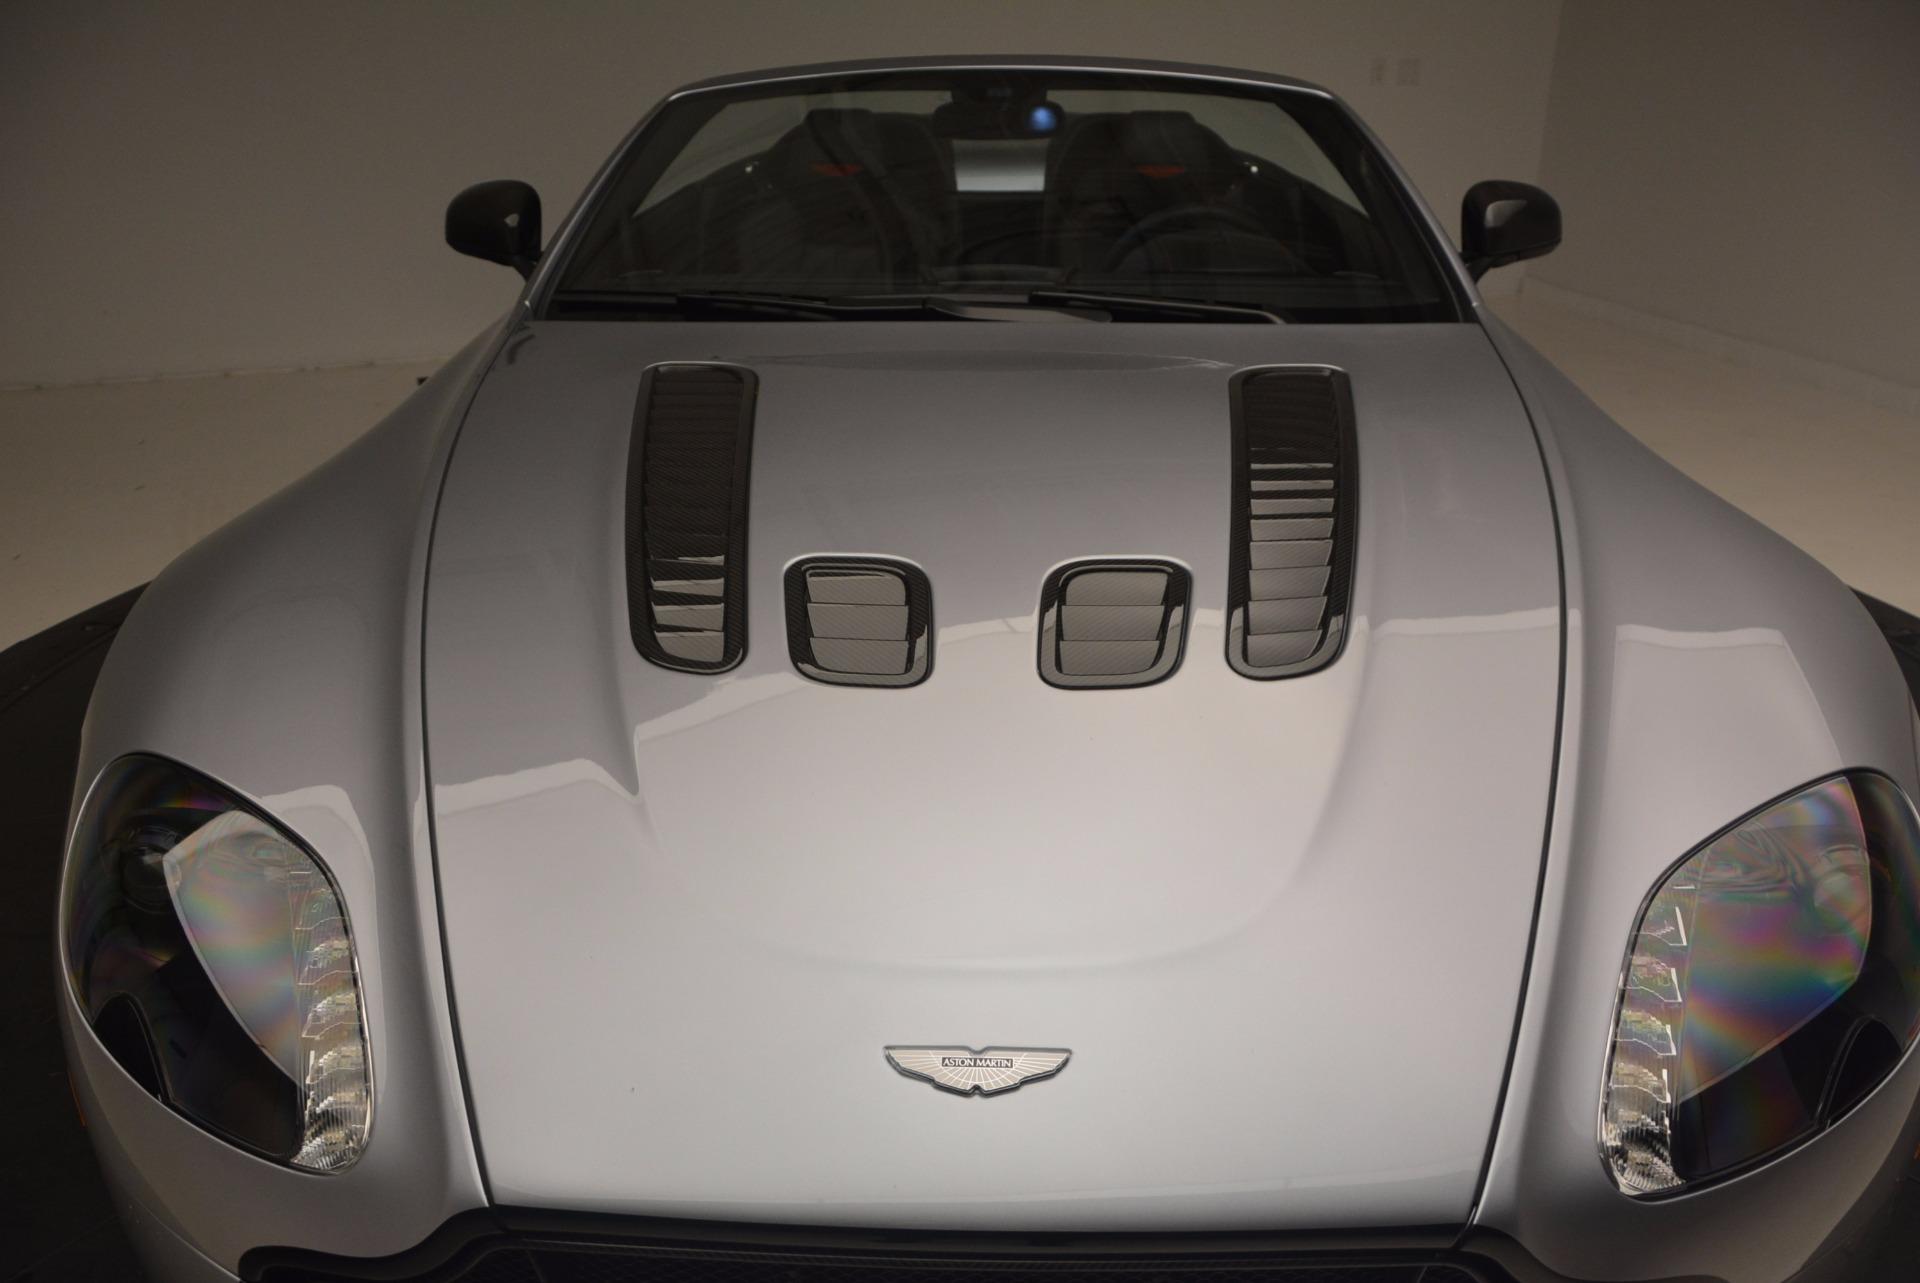 Used 2015 Aston Martin V12 Vantage S Roadster For Sale In Westport, CT 1130_p32